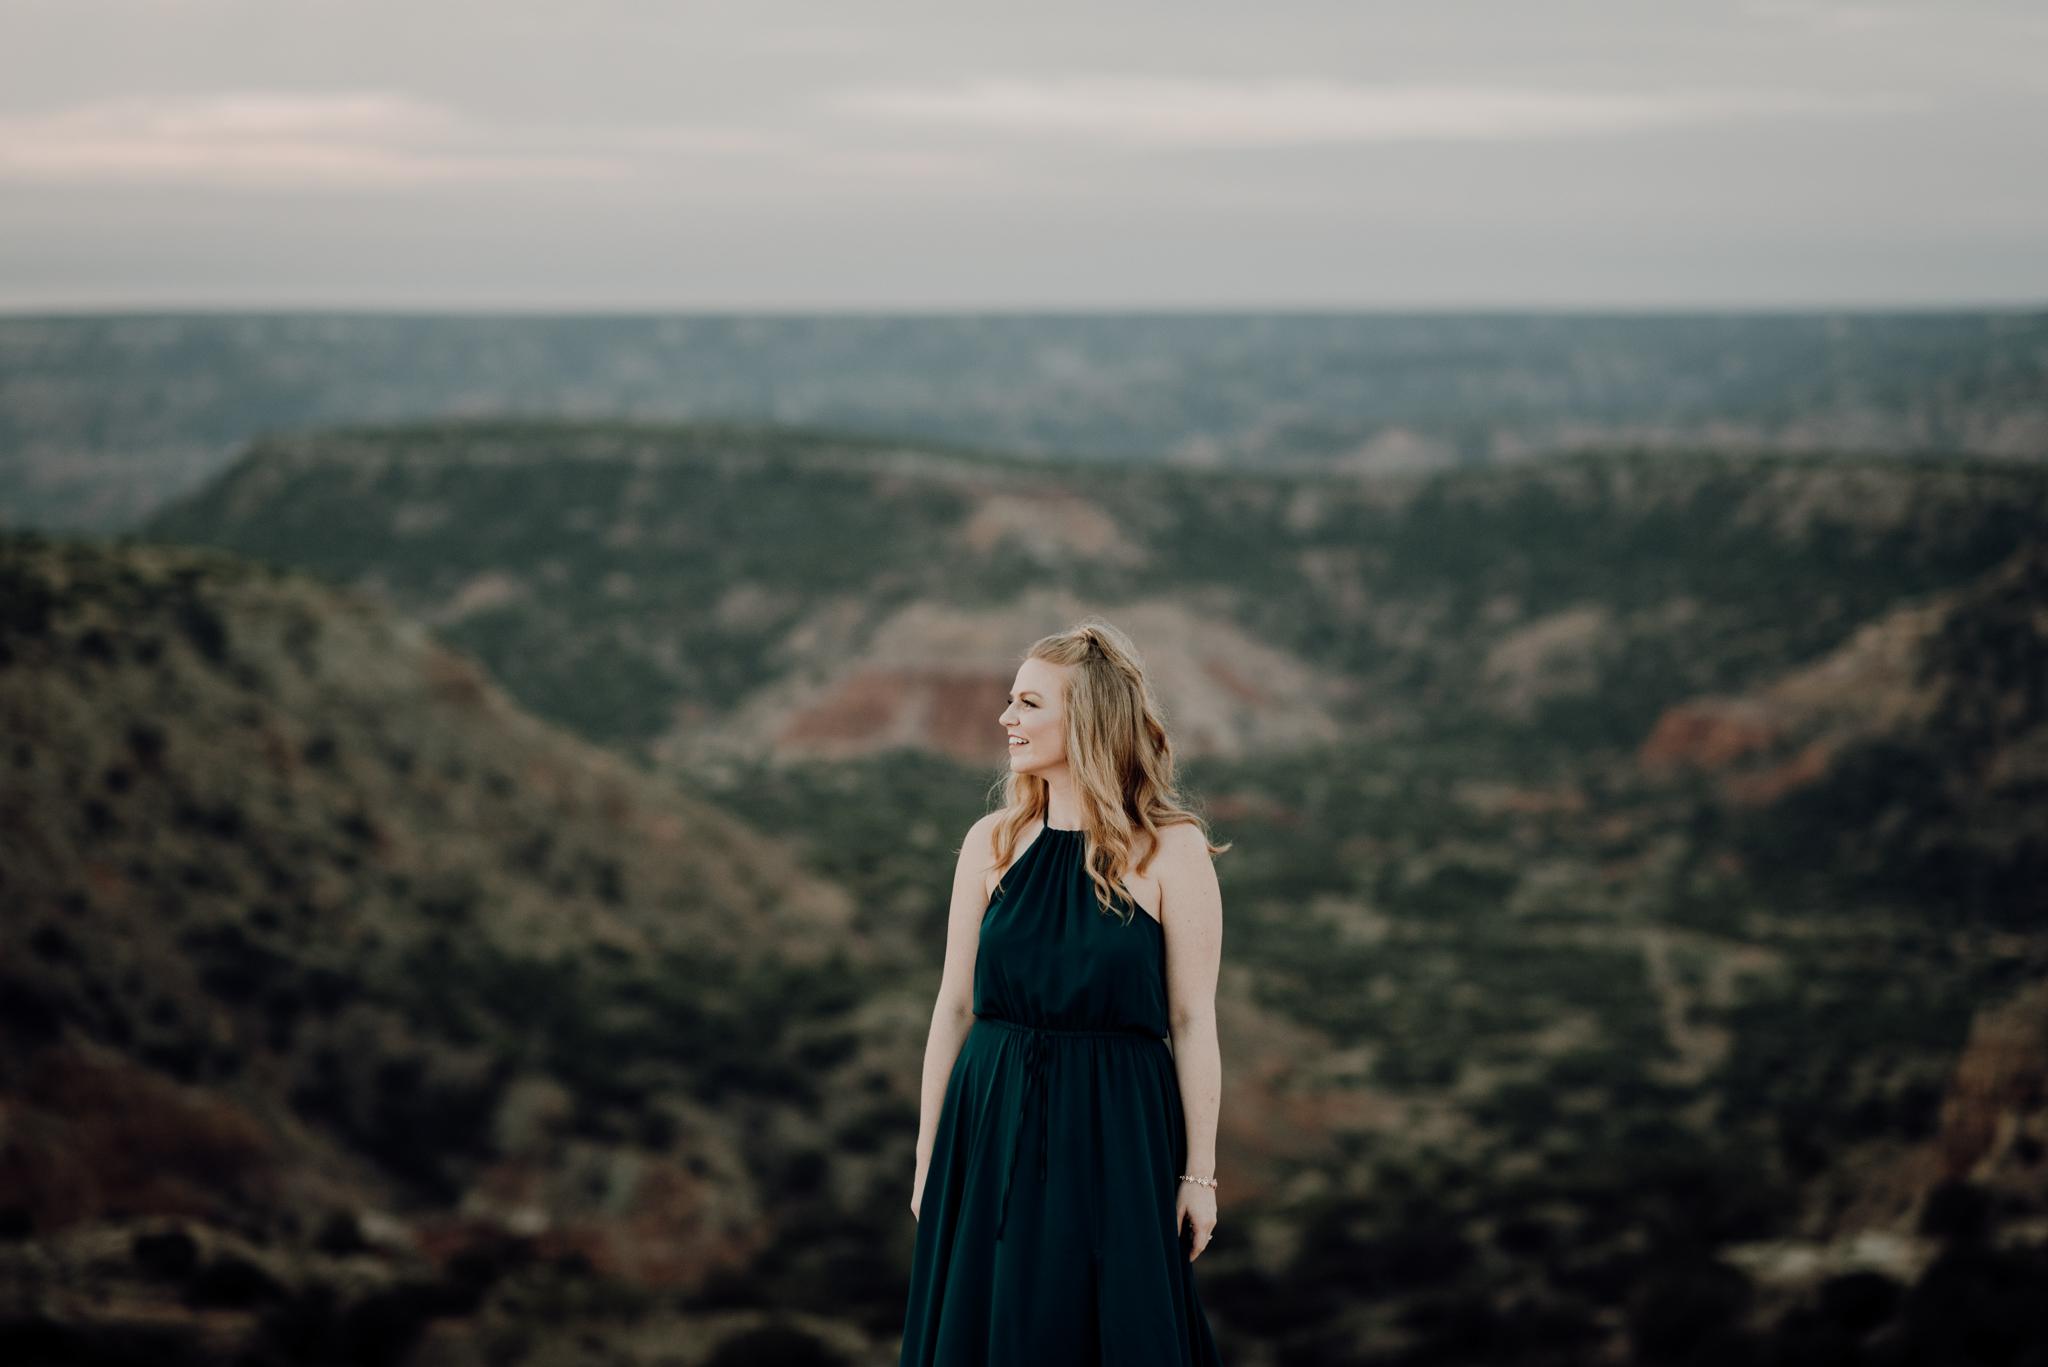 Houston Wedding Photographer-Palo Duro Canyon Engagement Session- Houston Wedding Photographer -Kristen Giles Photography-15.jpg